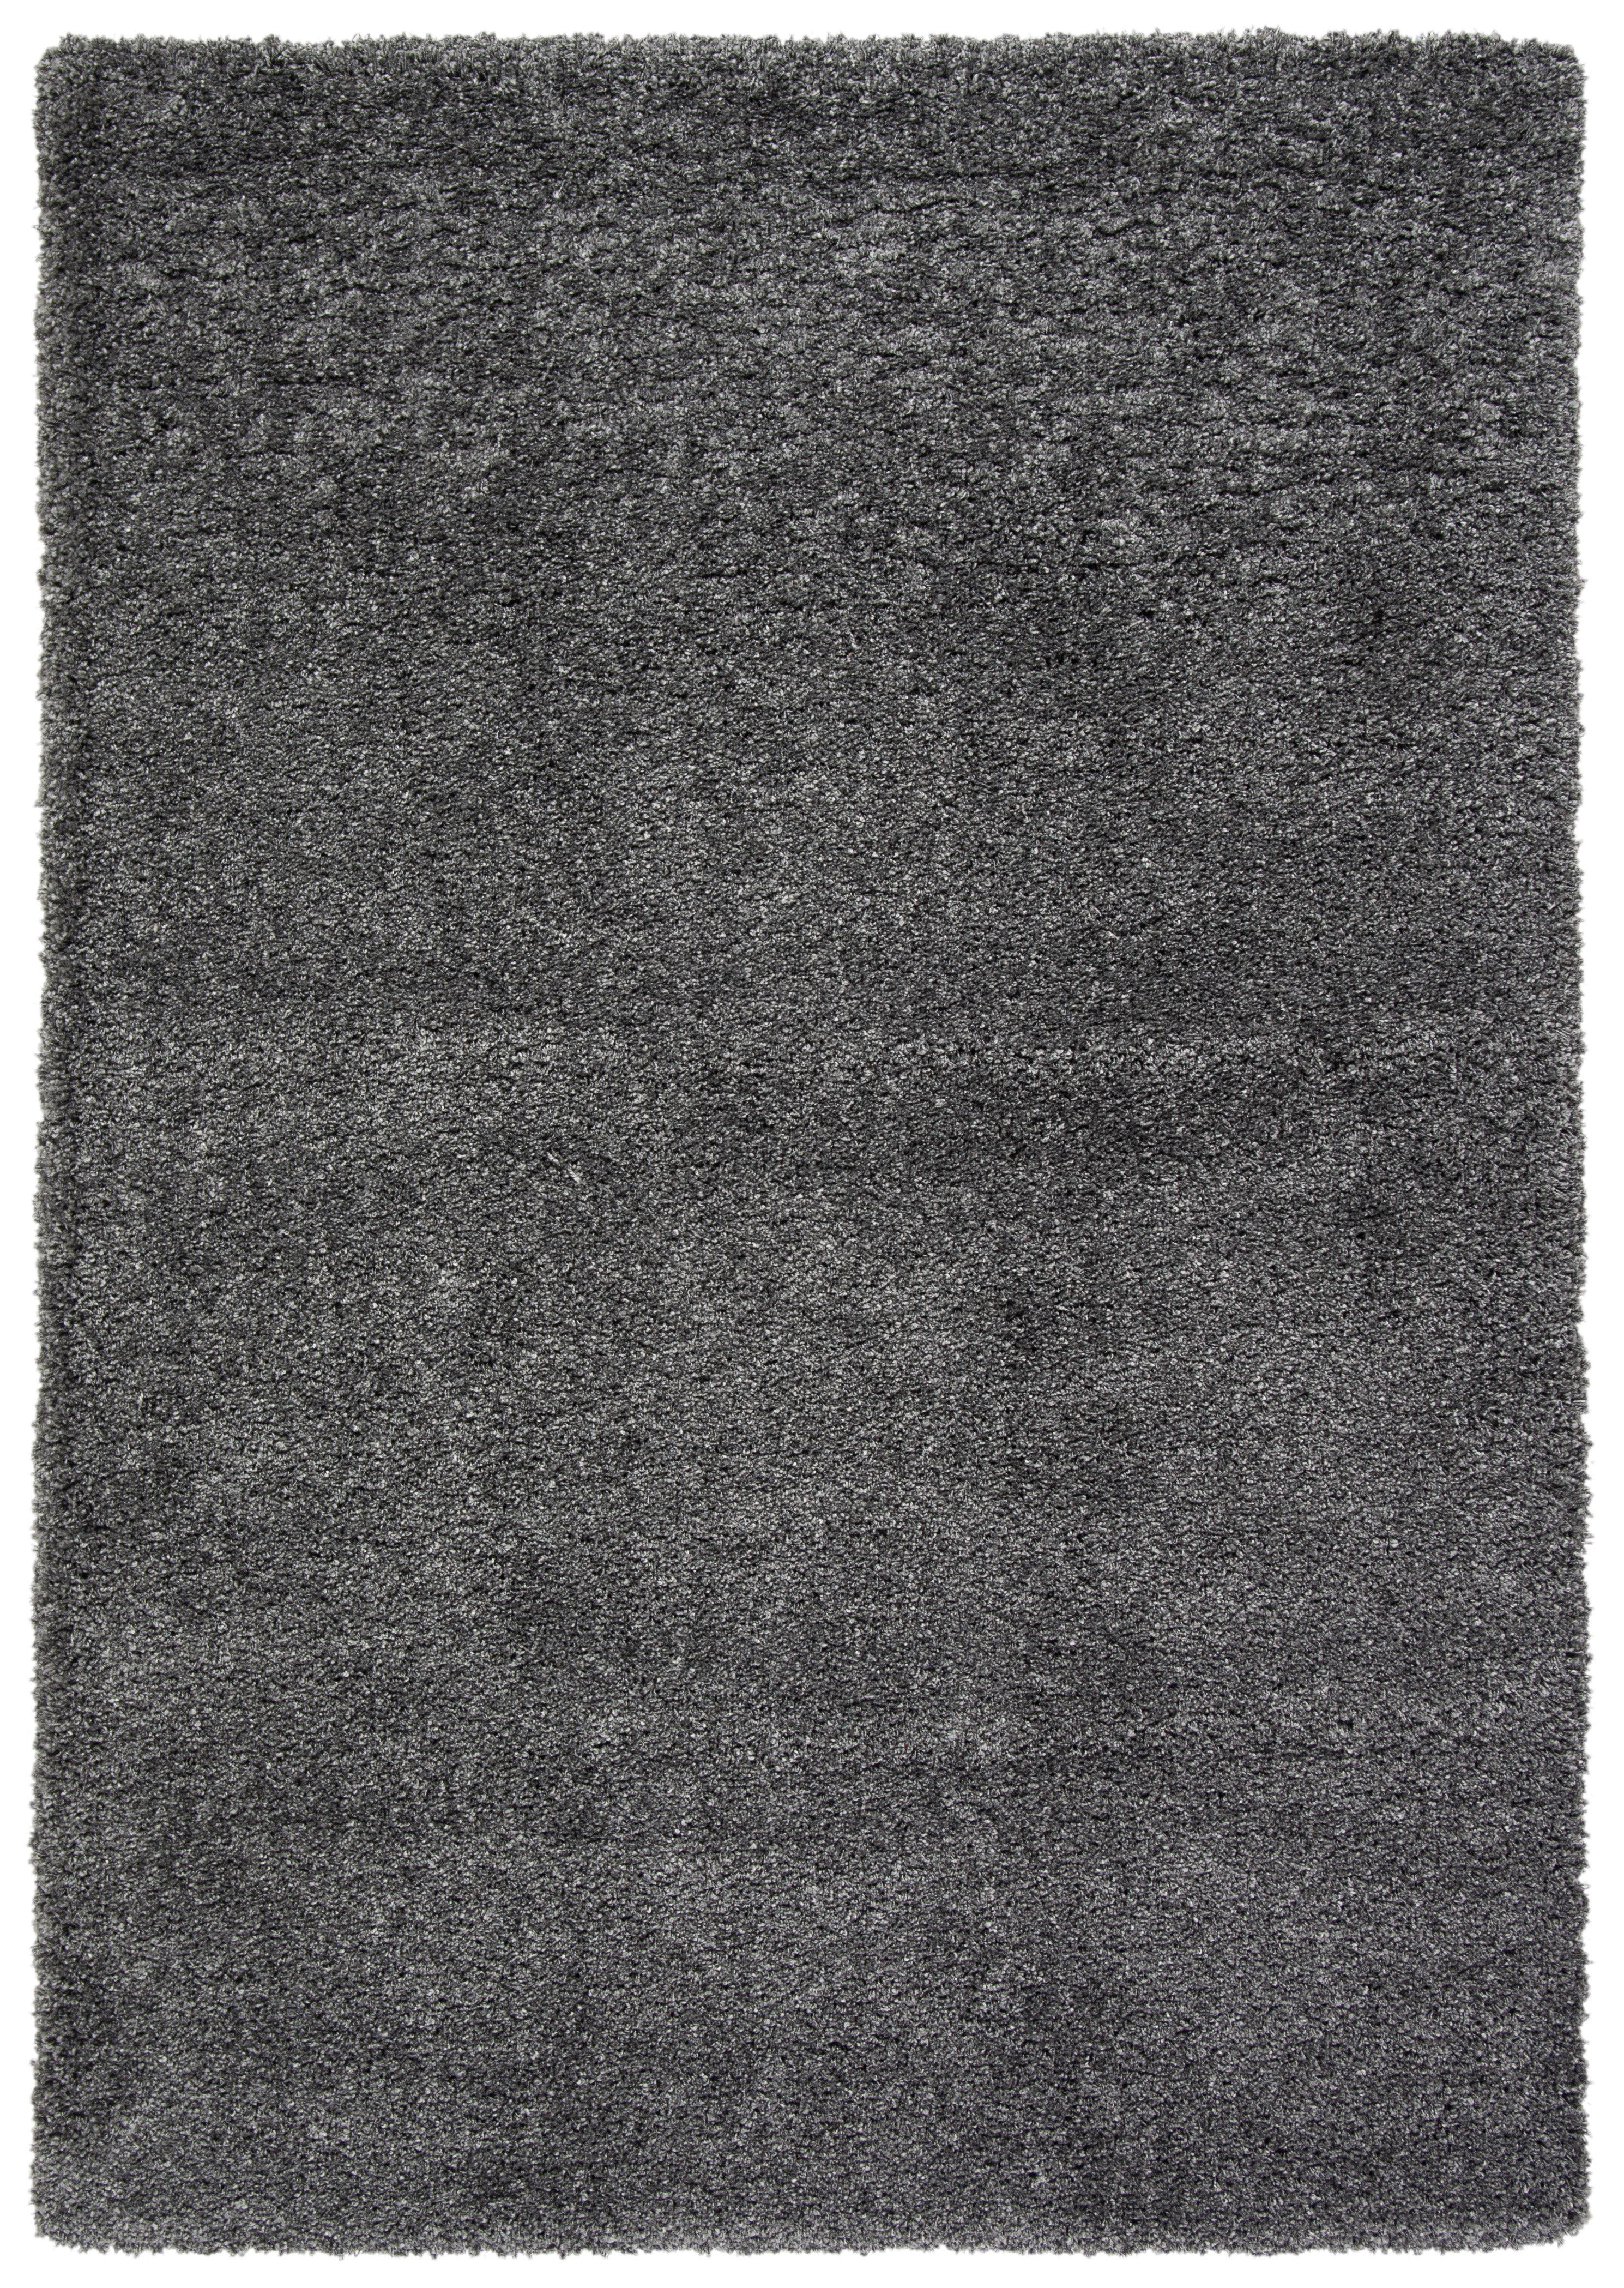 Willa Arlo Interiors Eunice Dark Gray